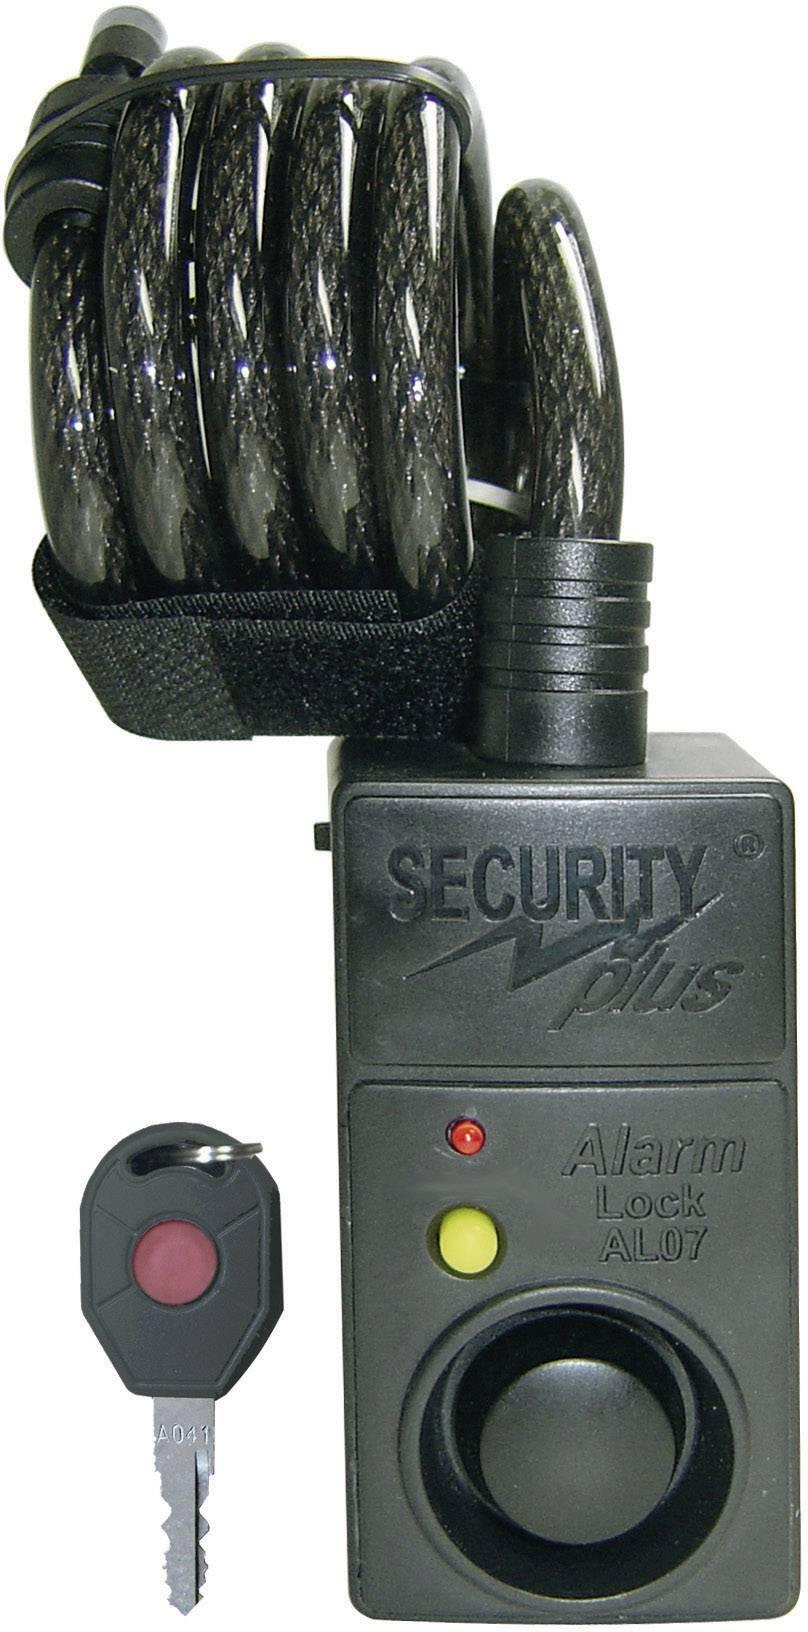 Kabelový zámek s alarmem Security Plus AL07, (Ø x d) 10 mm x 1200 mm, černá